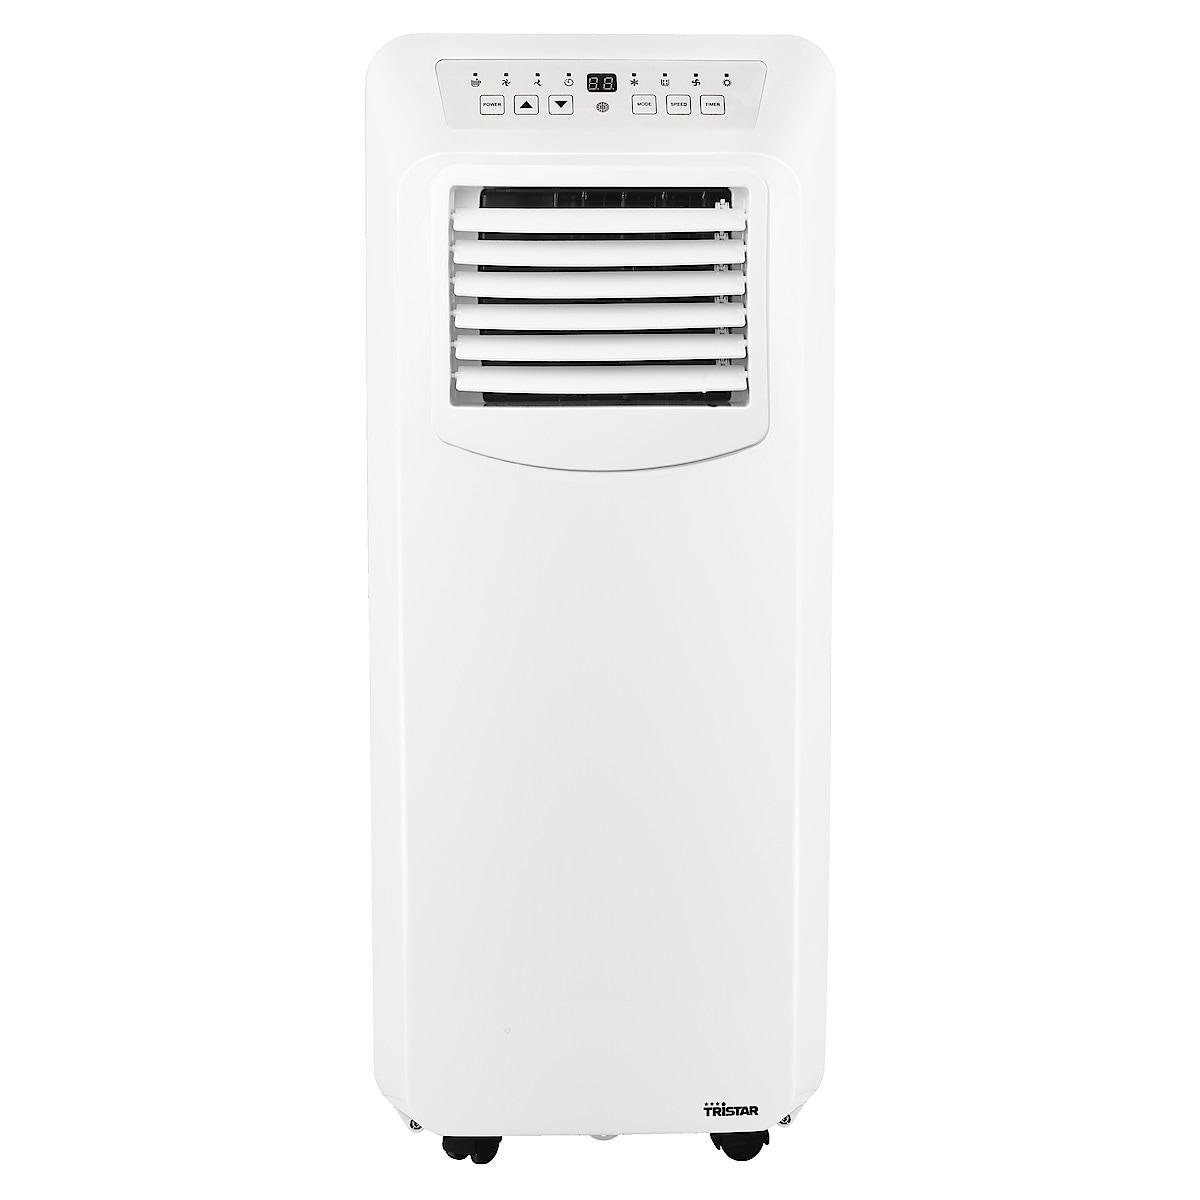 Luftkonditionering Tristar AC-5562